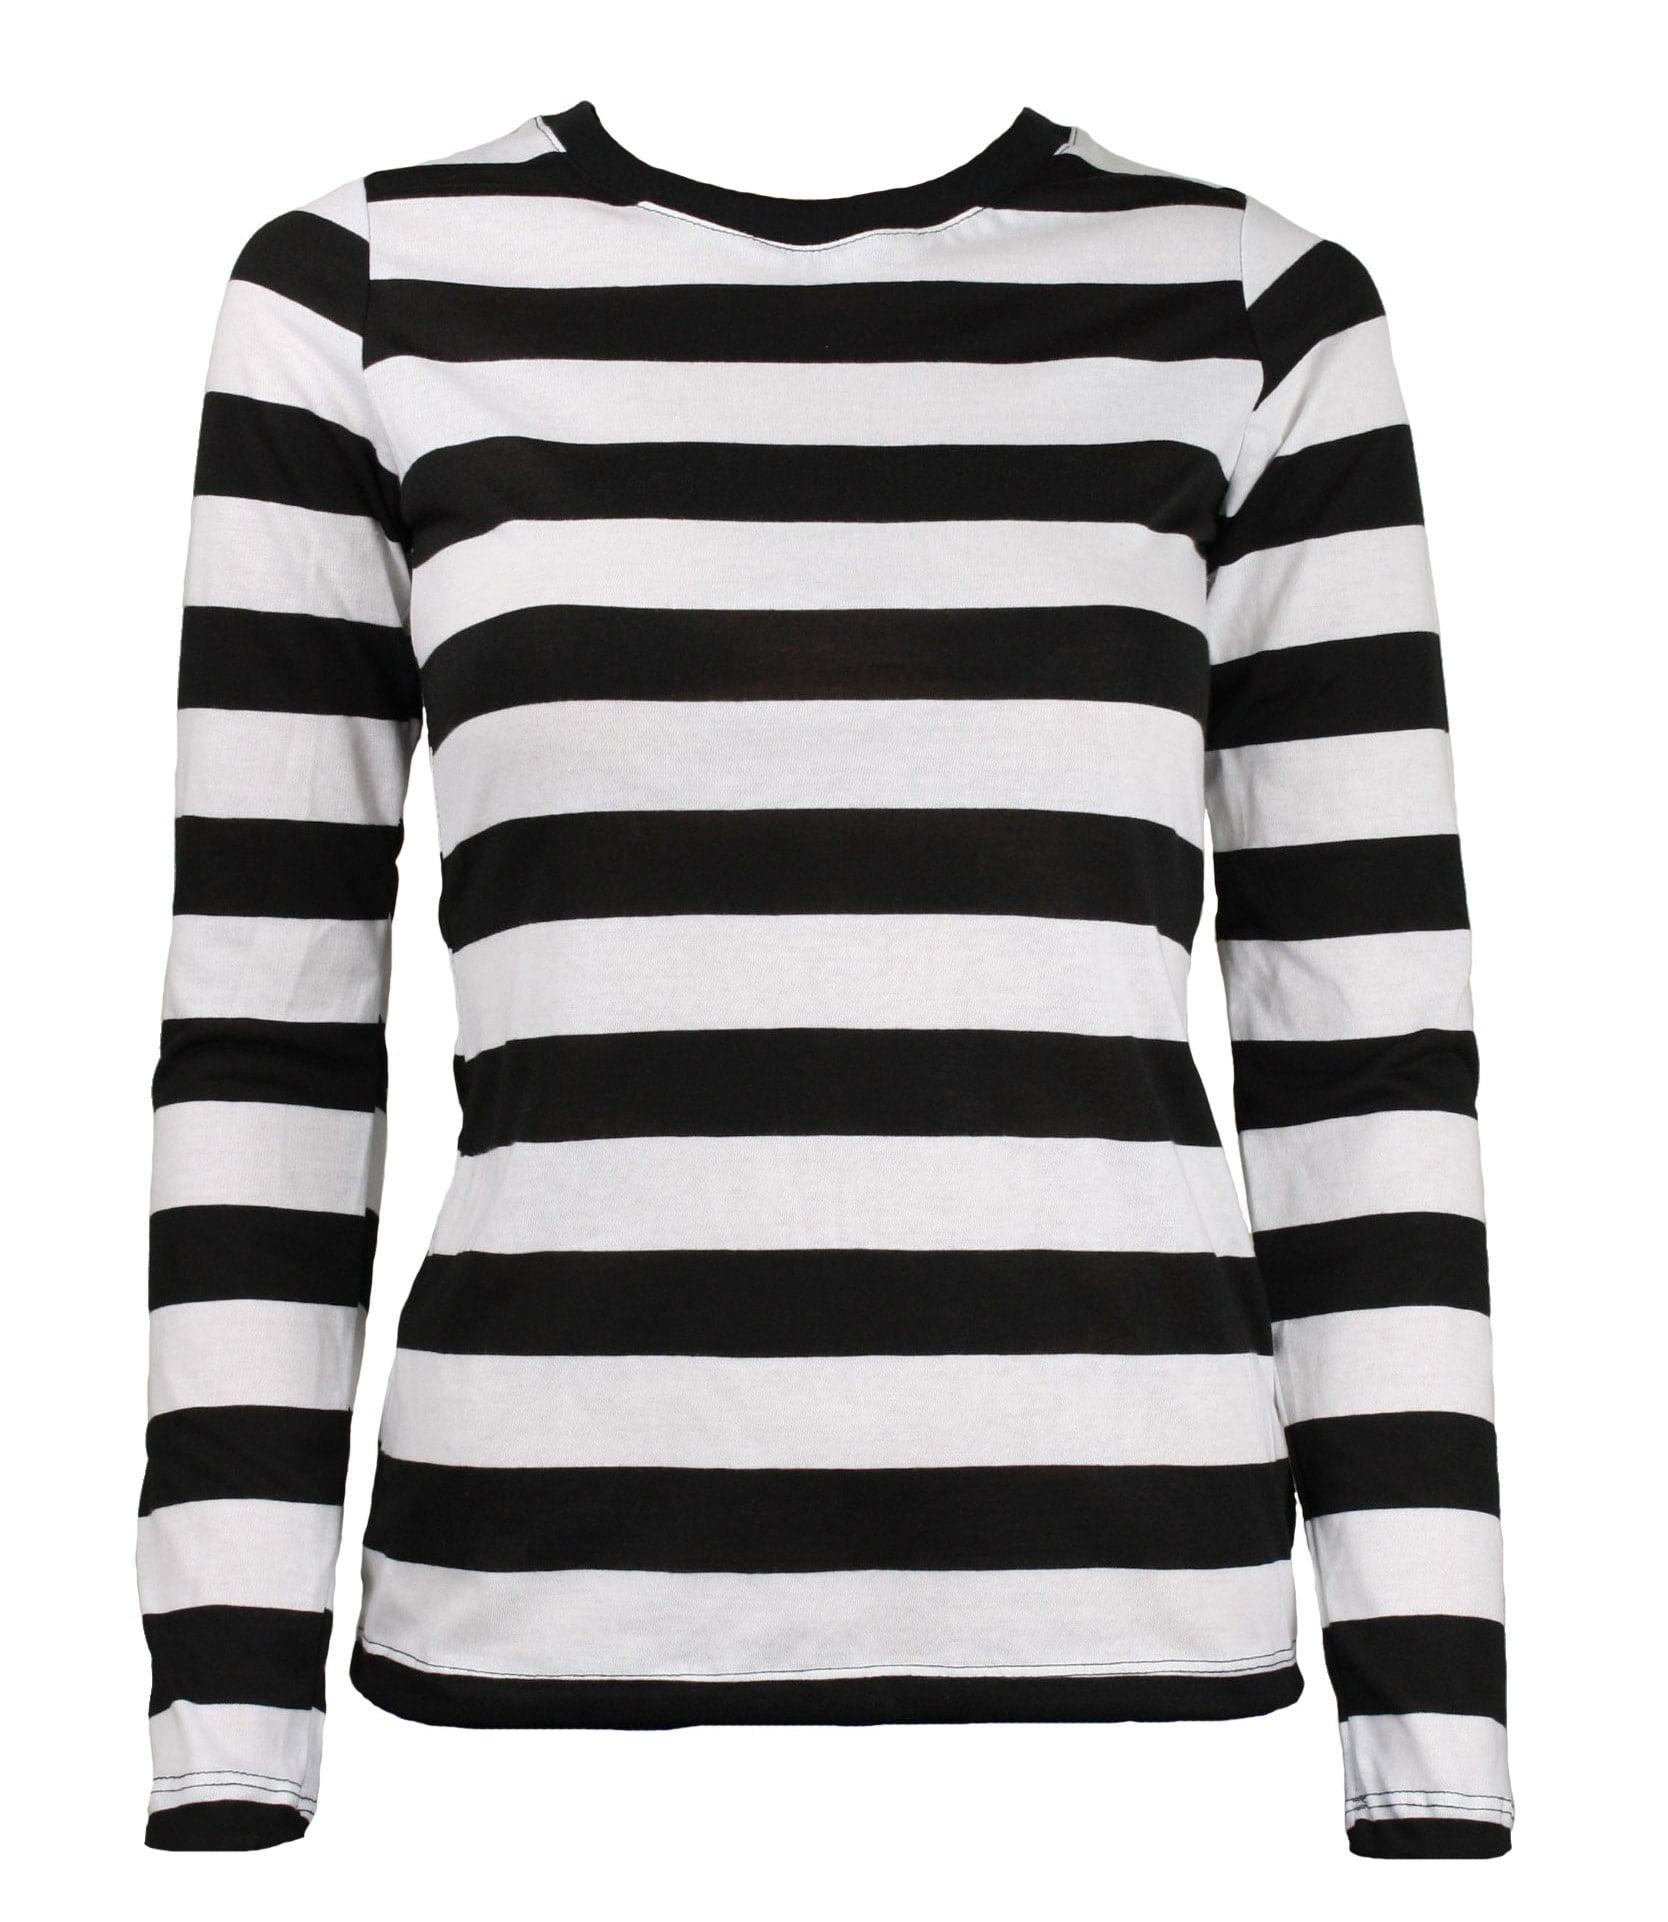 Tragic Mountain Long Sleeve Black White Striped Women S Shirt Medium Walmart Com Walmart Com